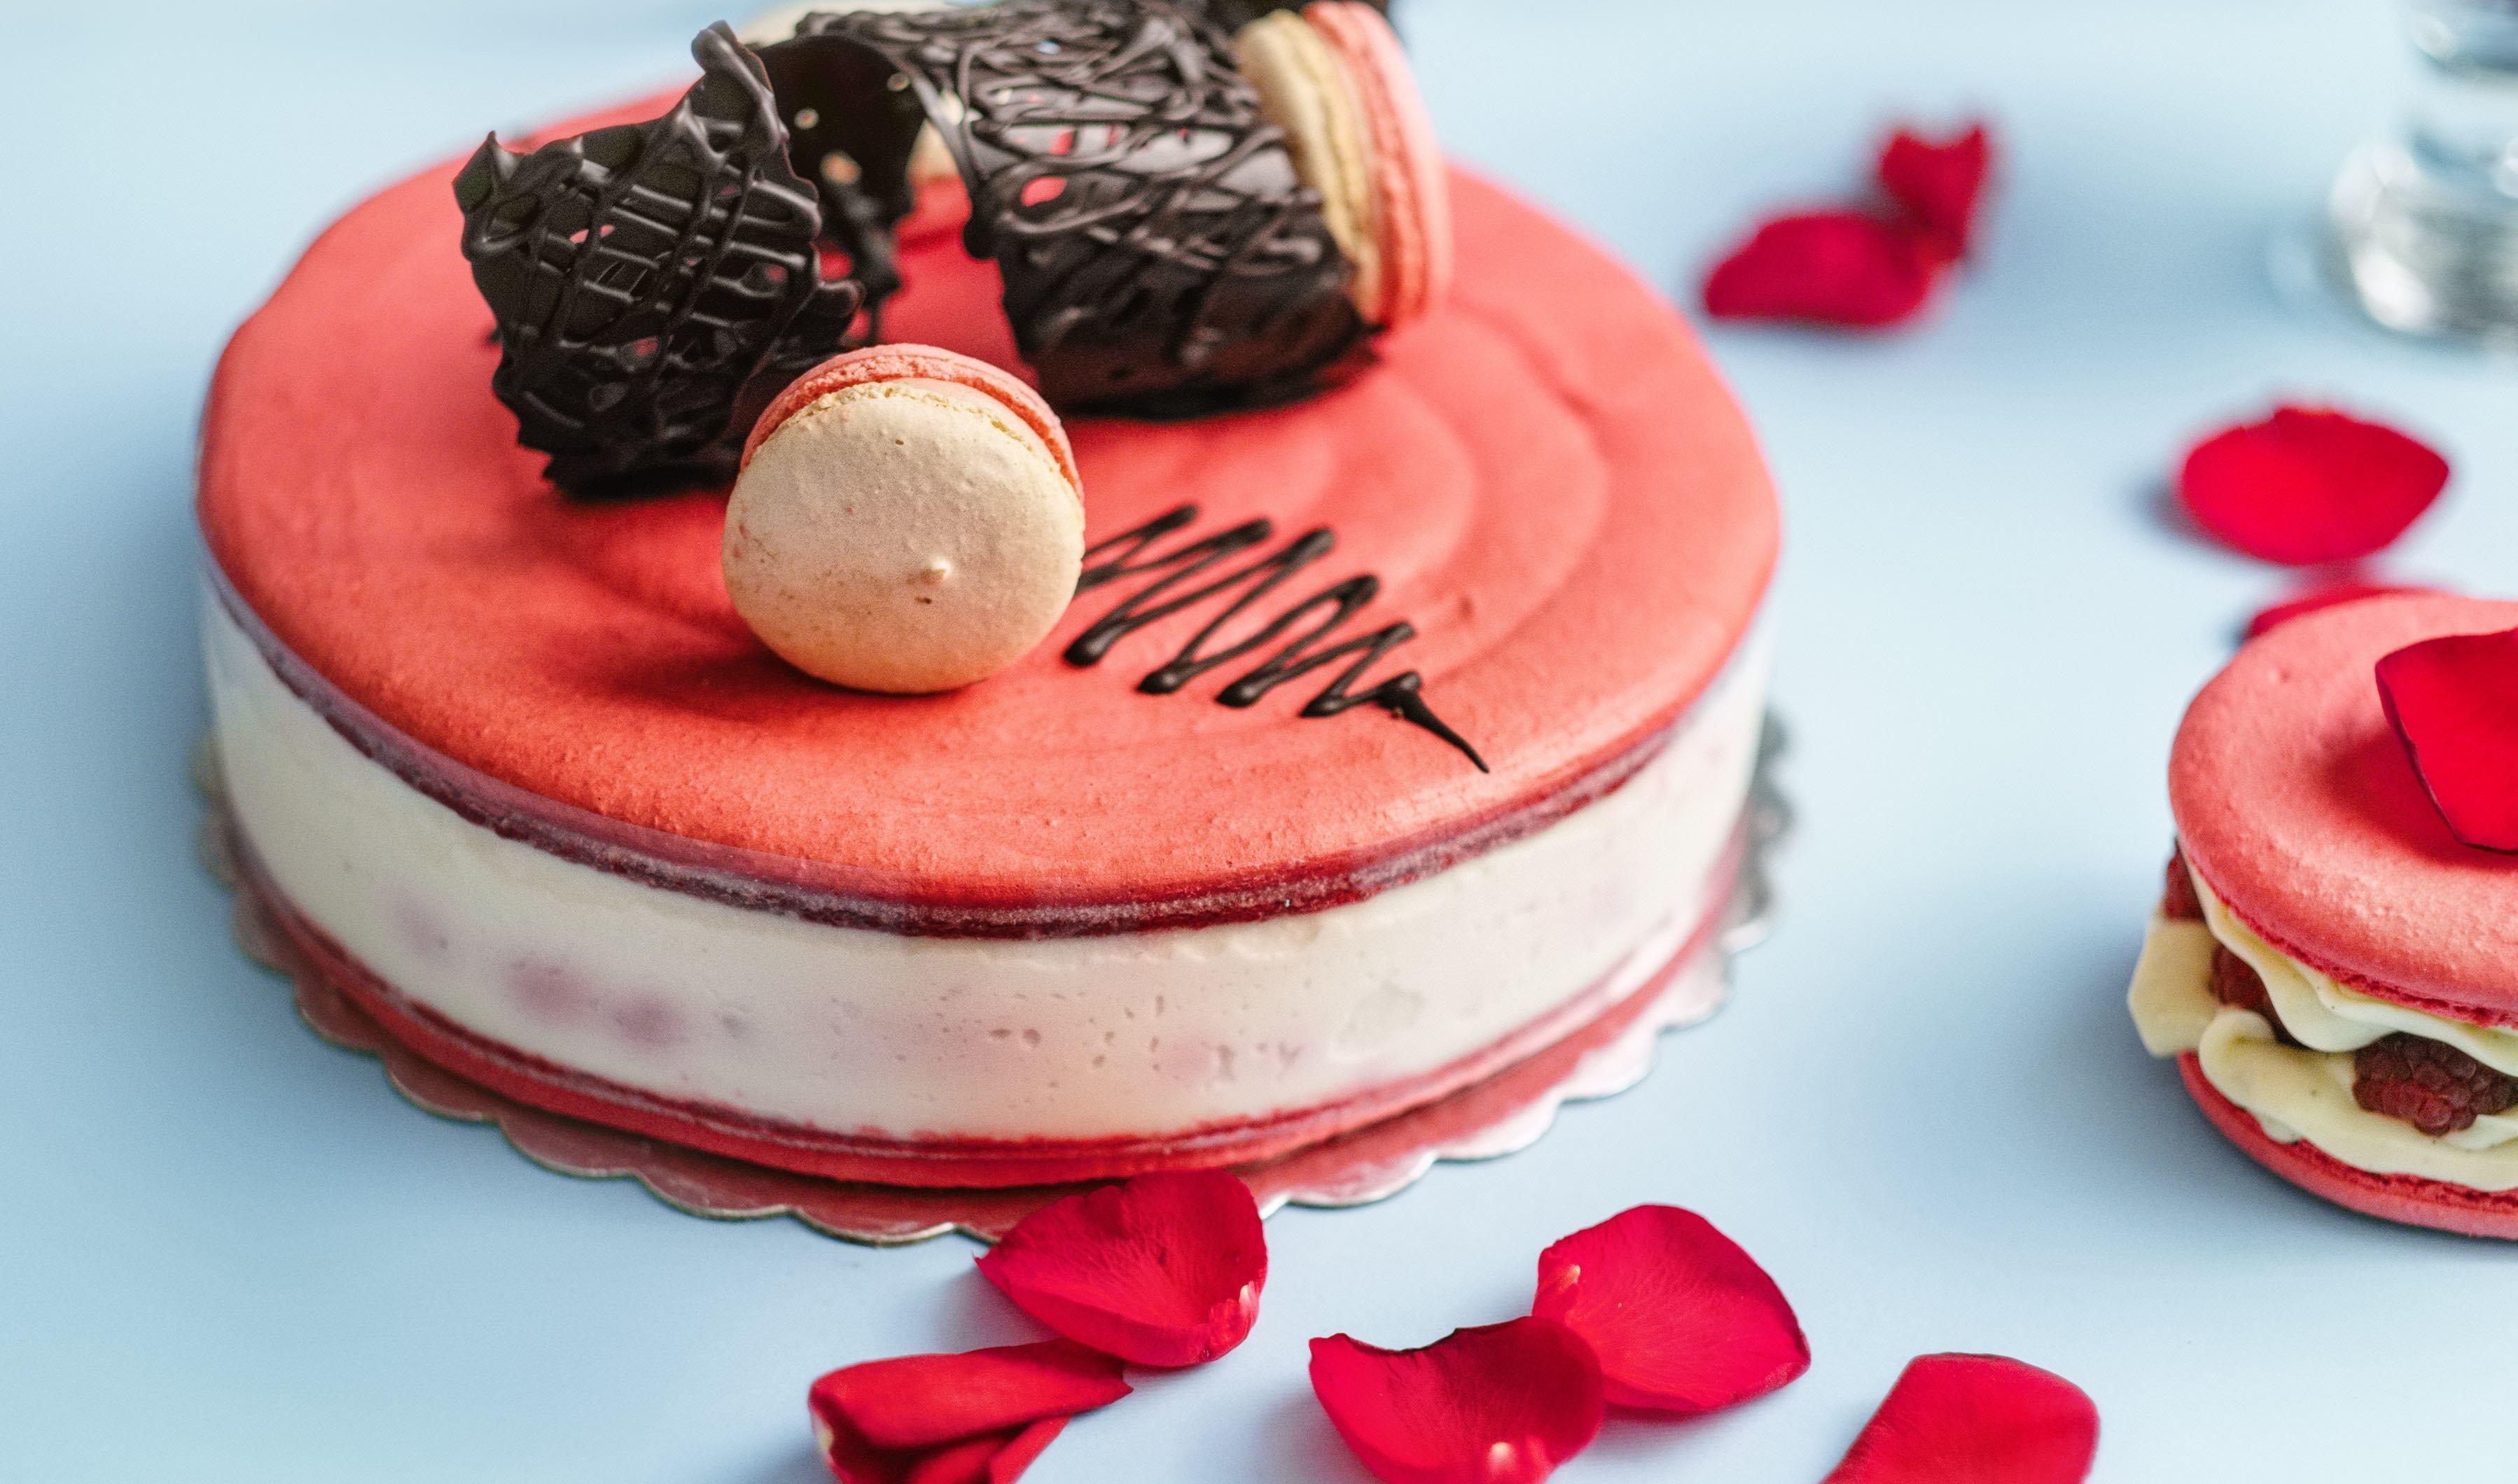 cake with rose petals